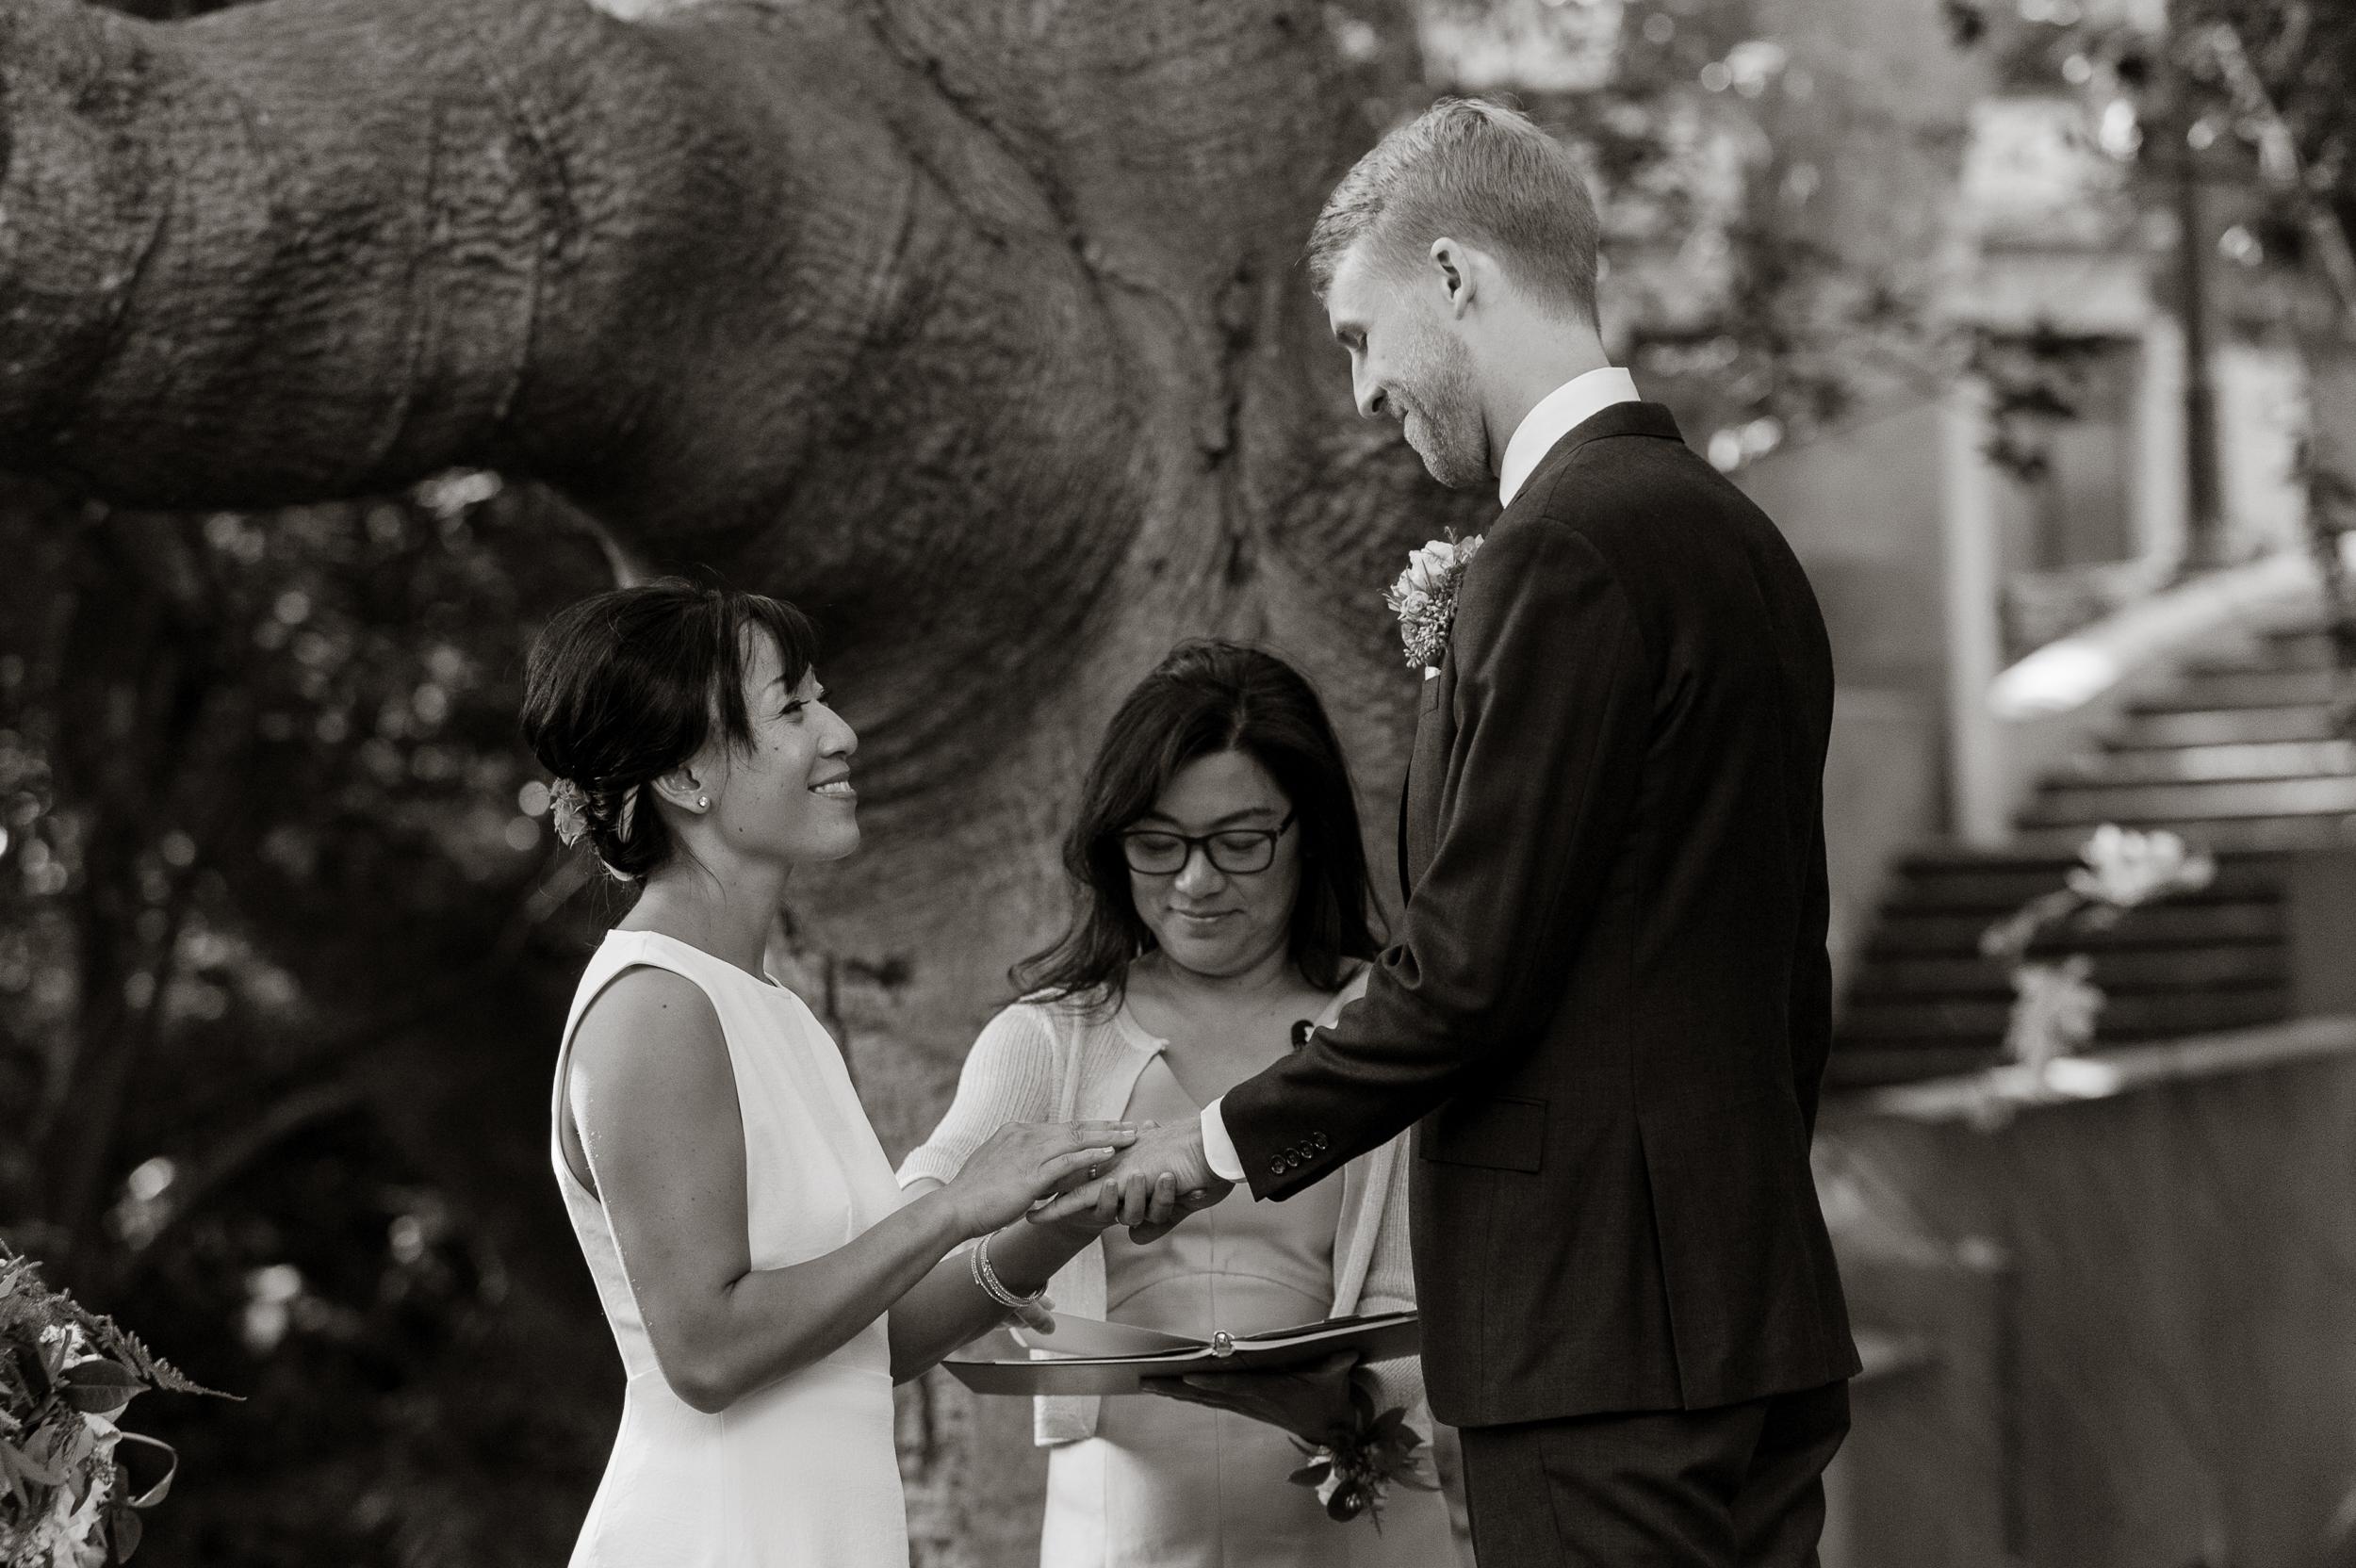 faculty-club-berkeley-wedding-photographer-vc035.jpg